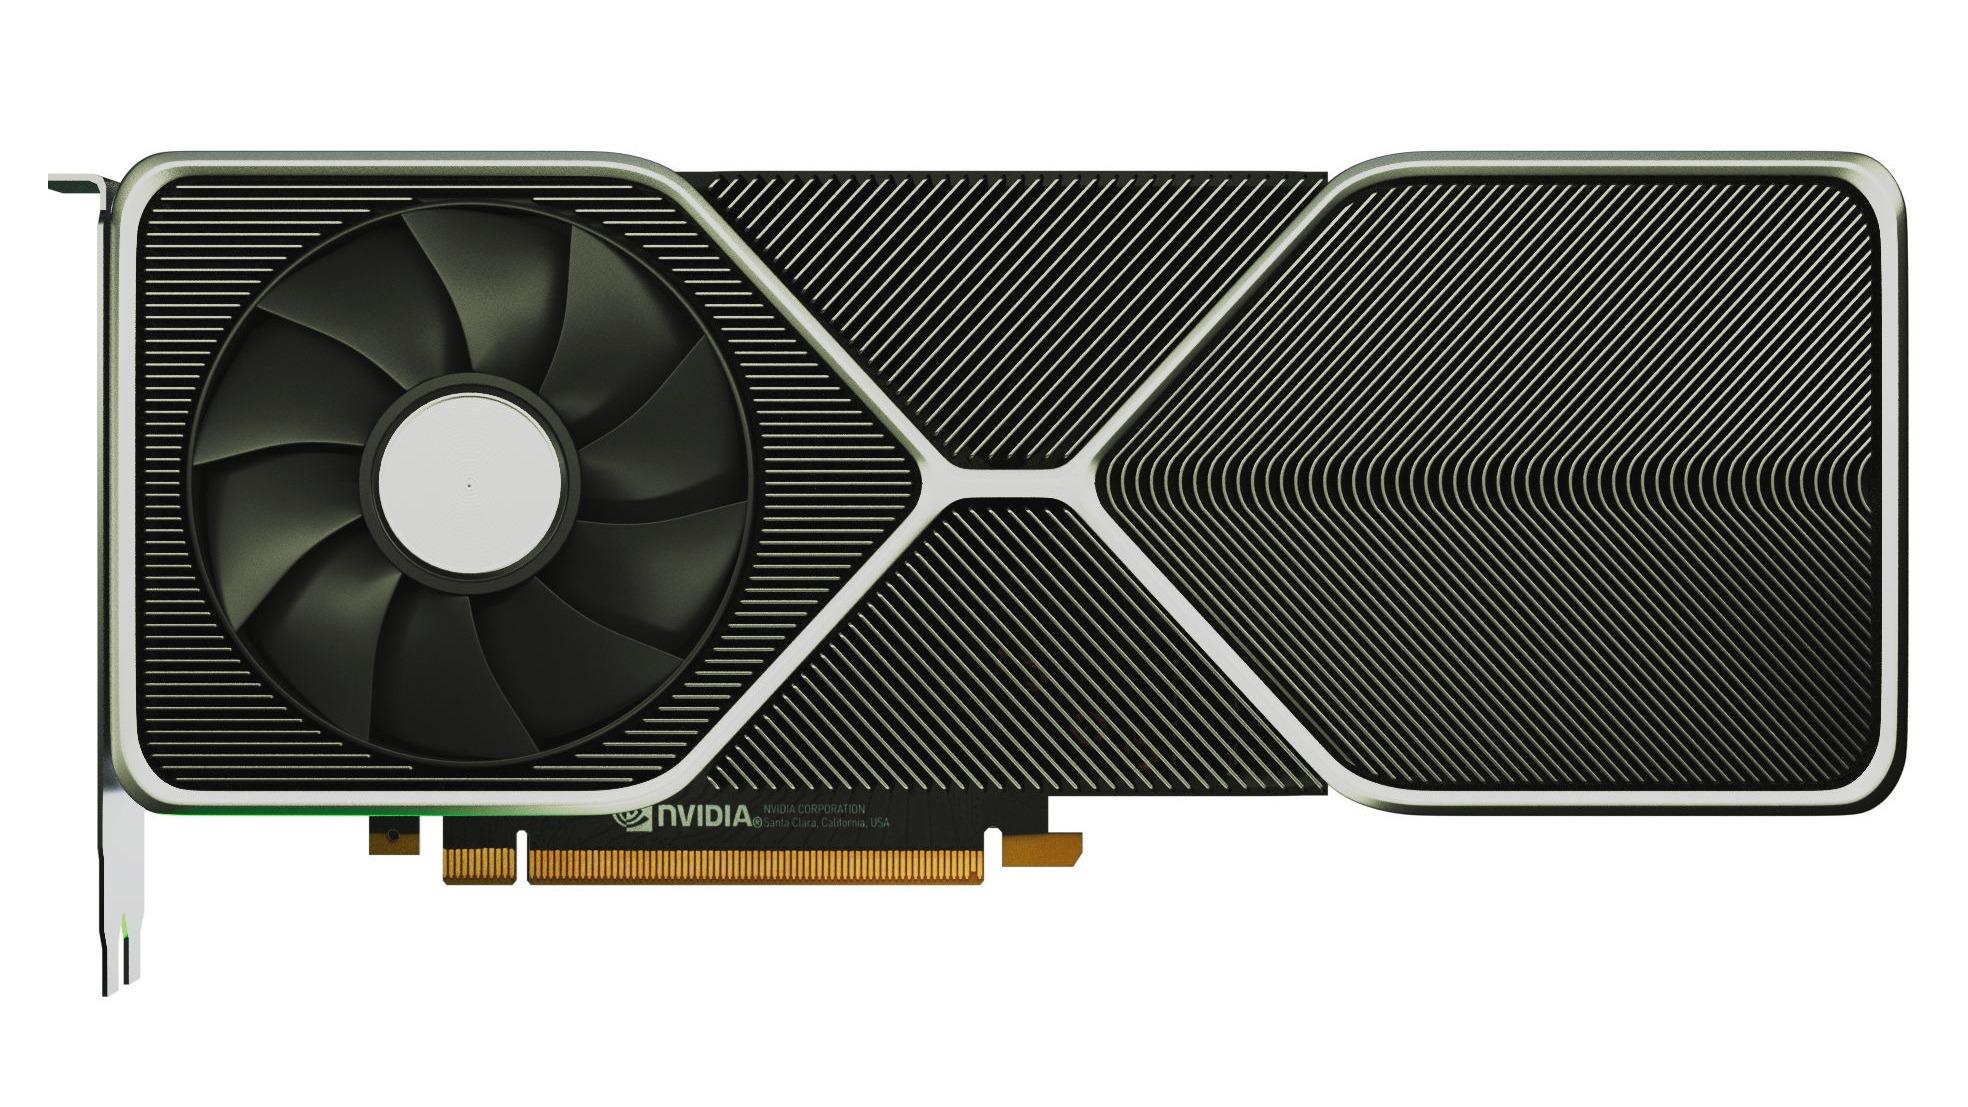 nvidia rtx 30 cooler leak render